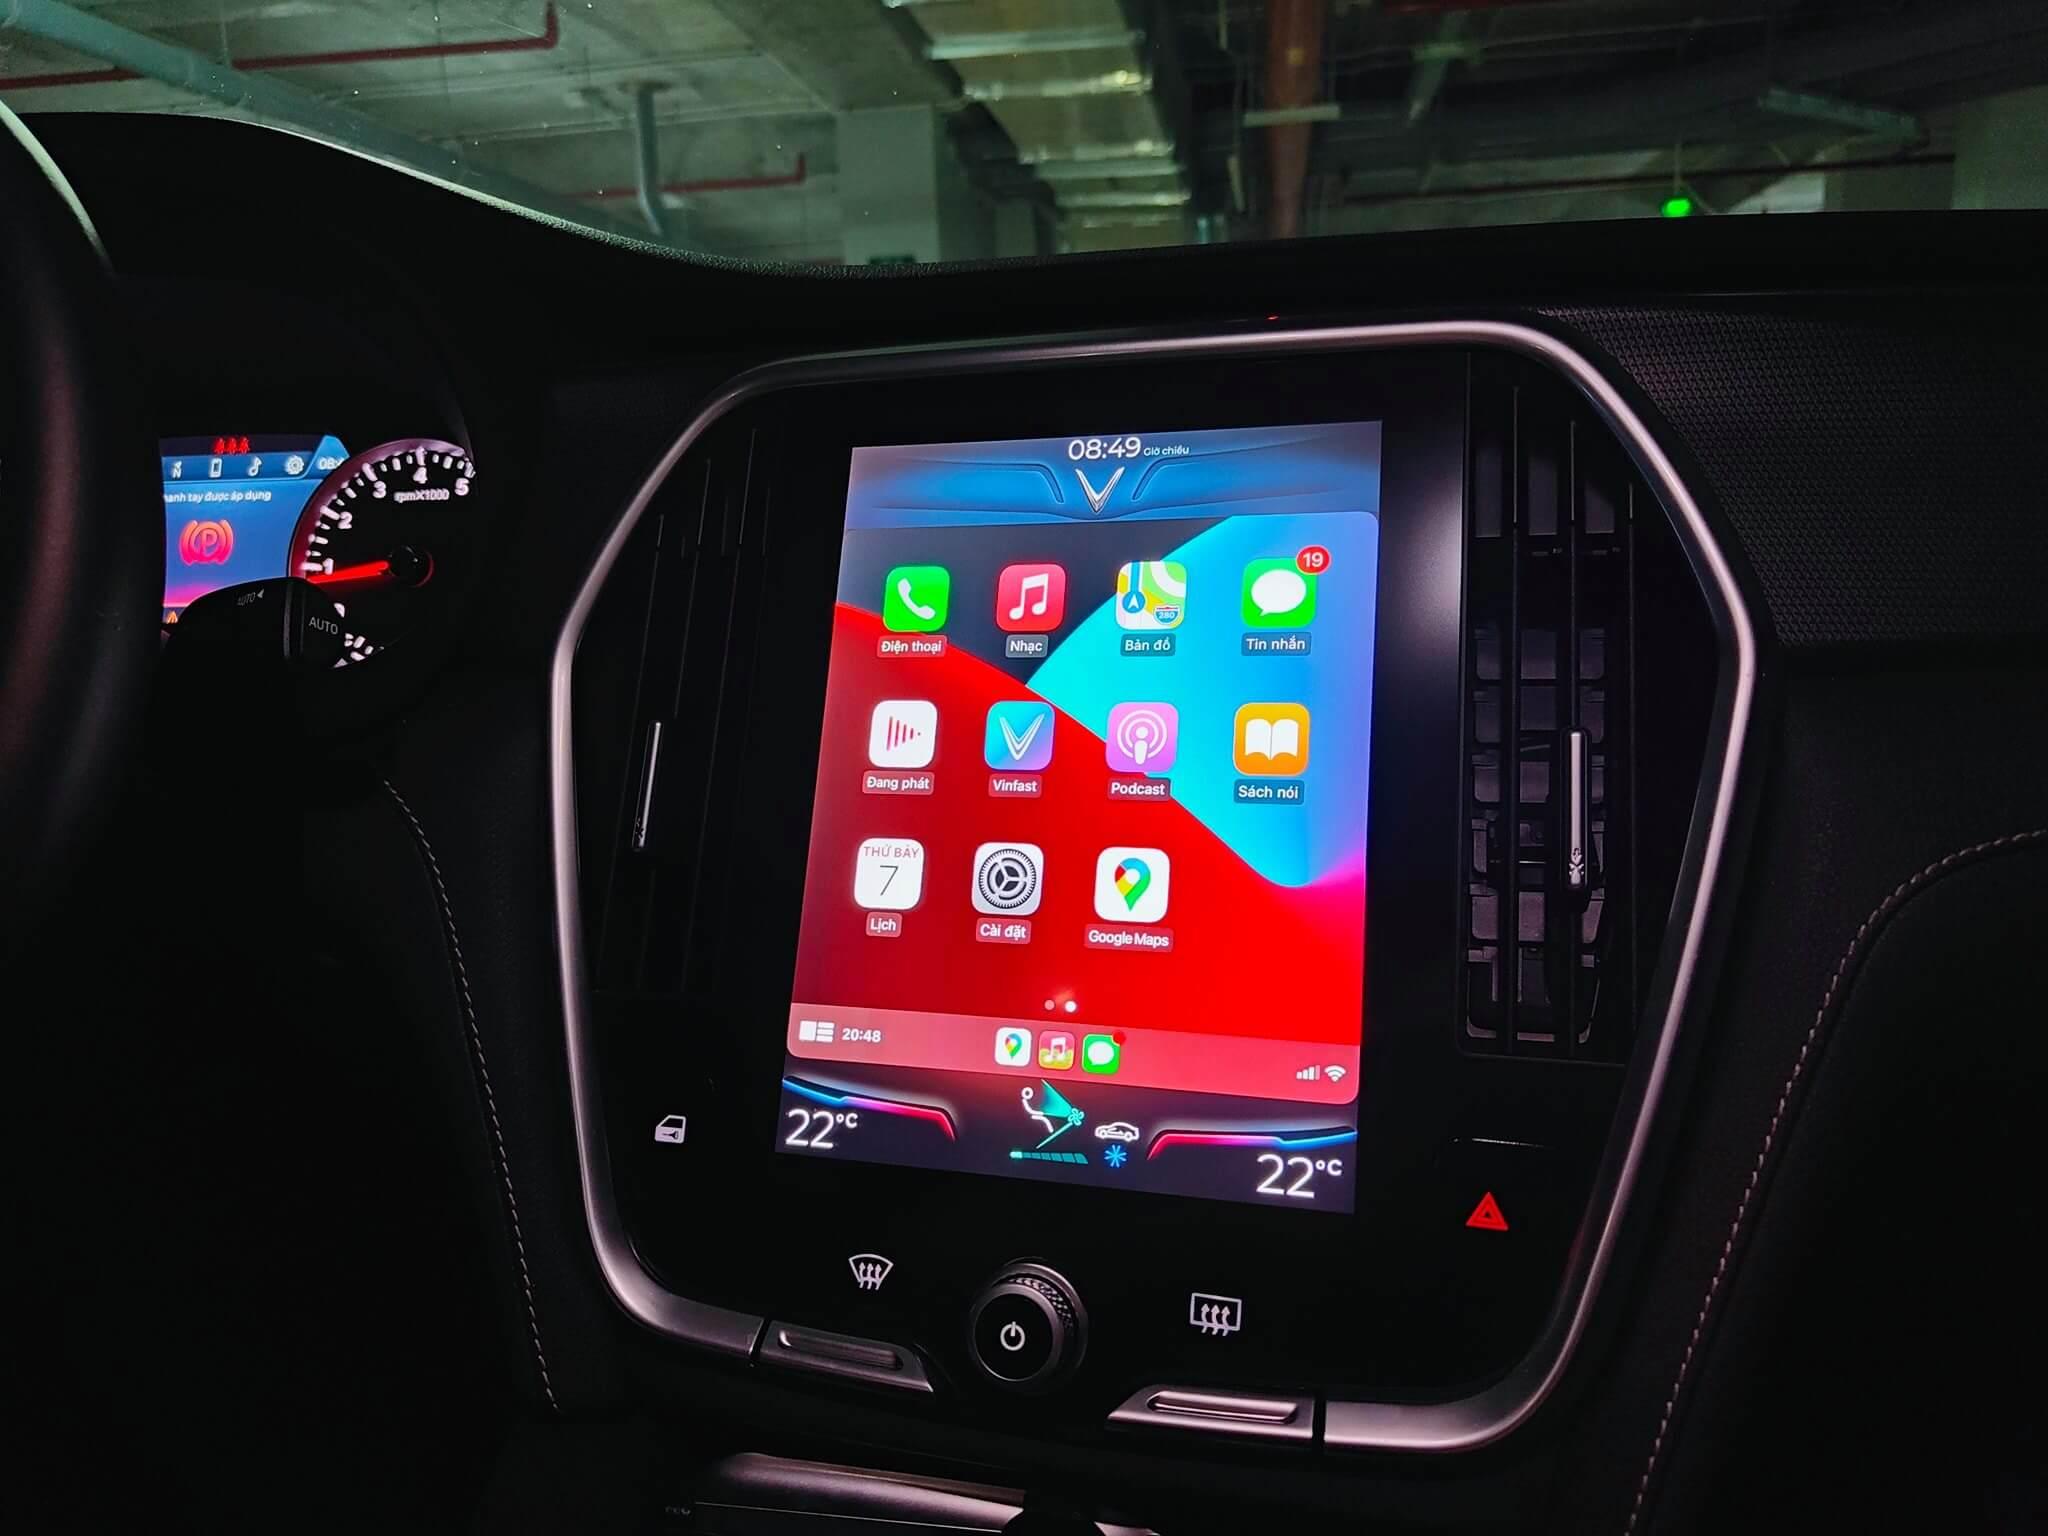 Link download file Update Apple Carplay Vinfast Lux A 2021